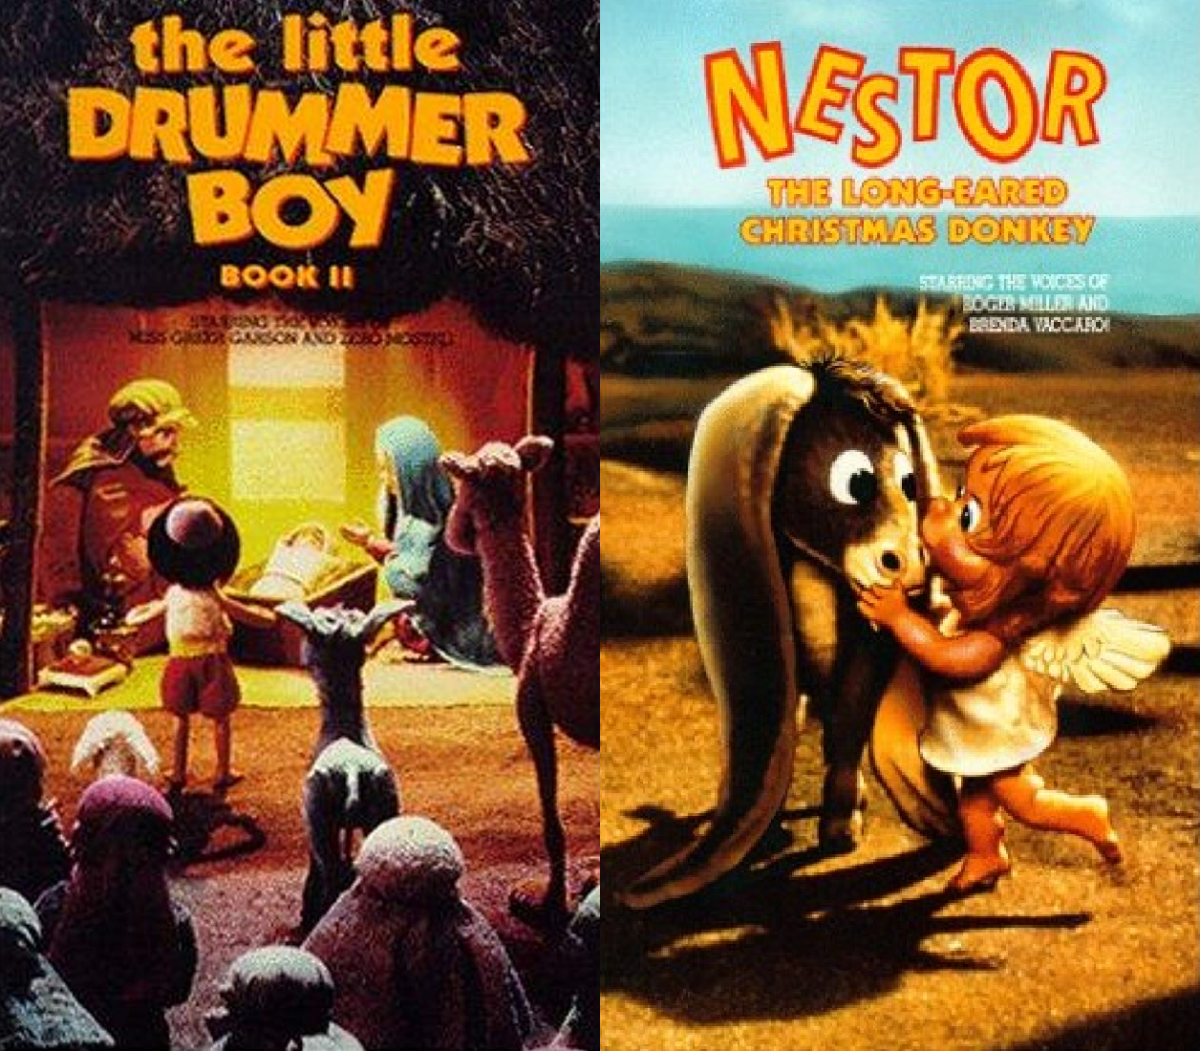 Rankin/Bass Retrospective: 'The Little Drummer Boy Book II'/'Nestor the Long-Eared Christmas Donkey'